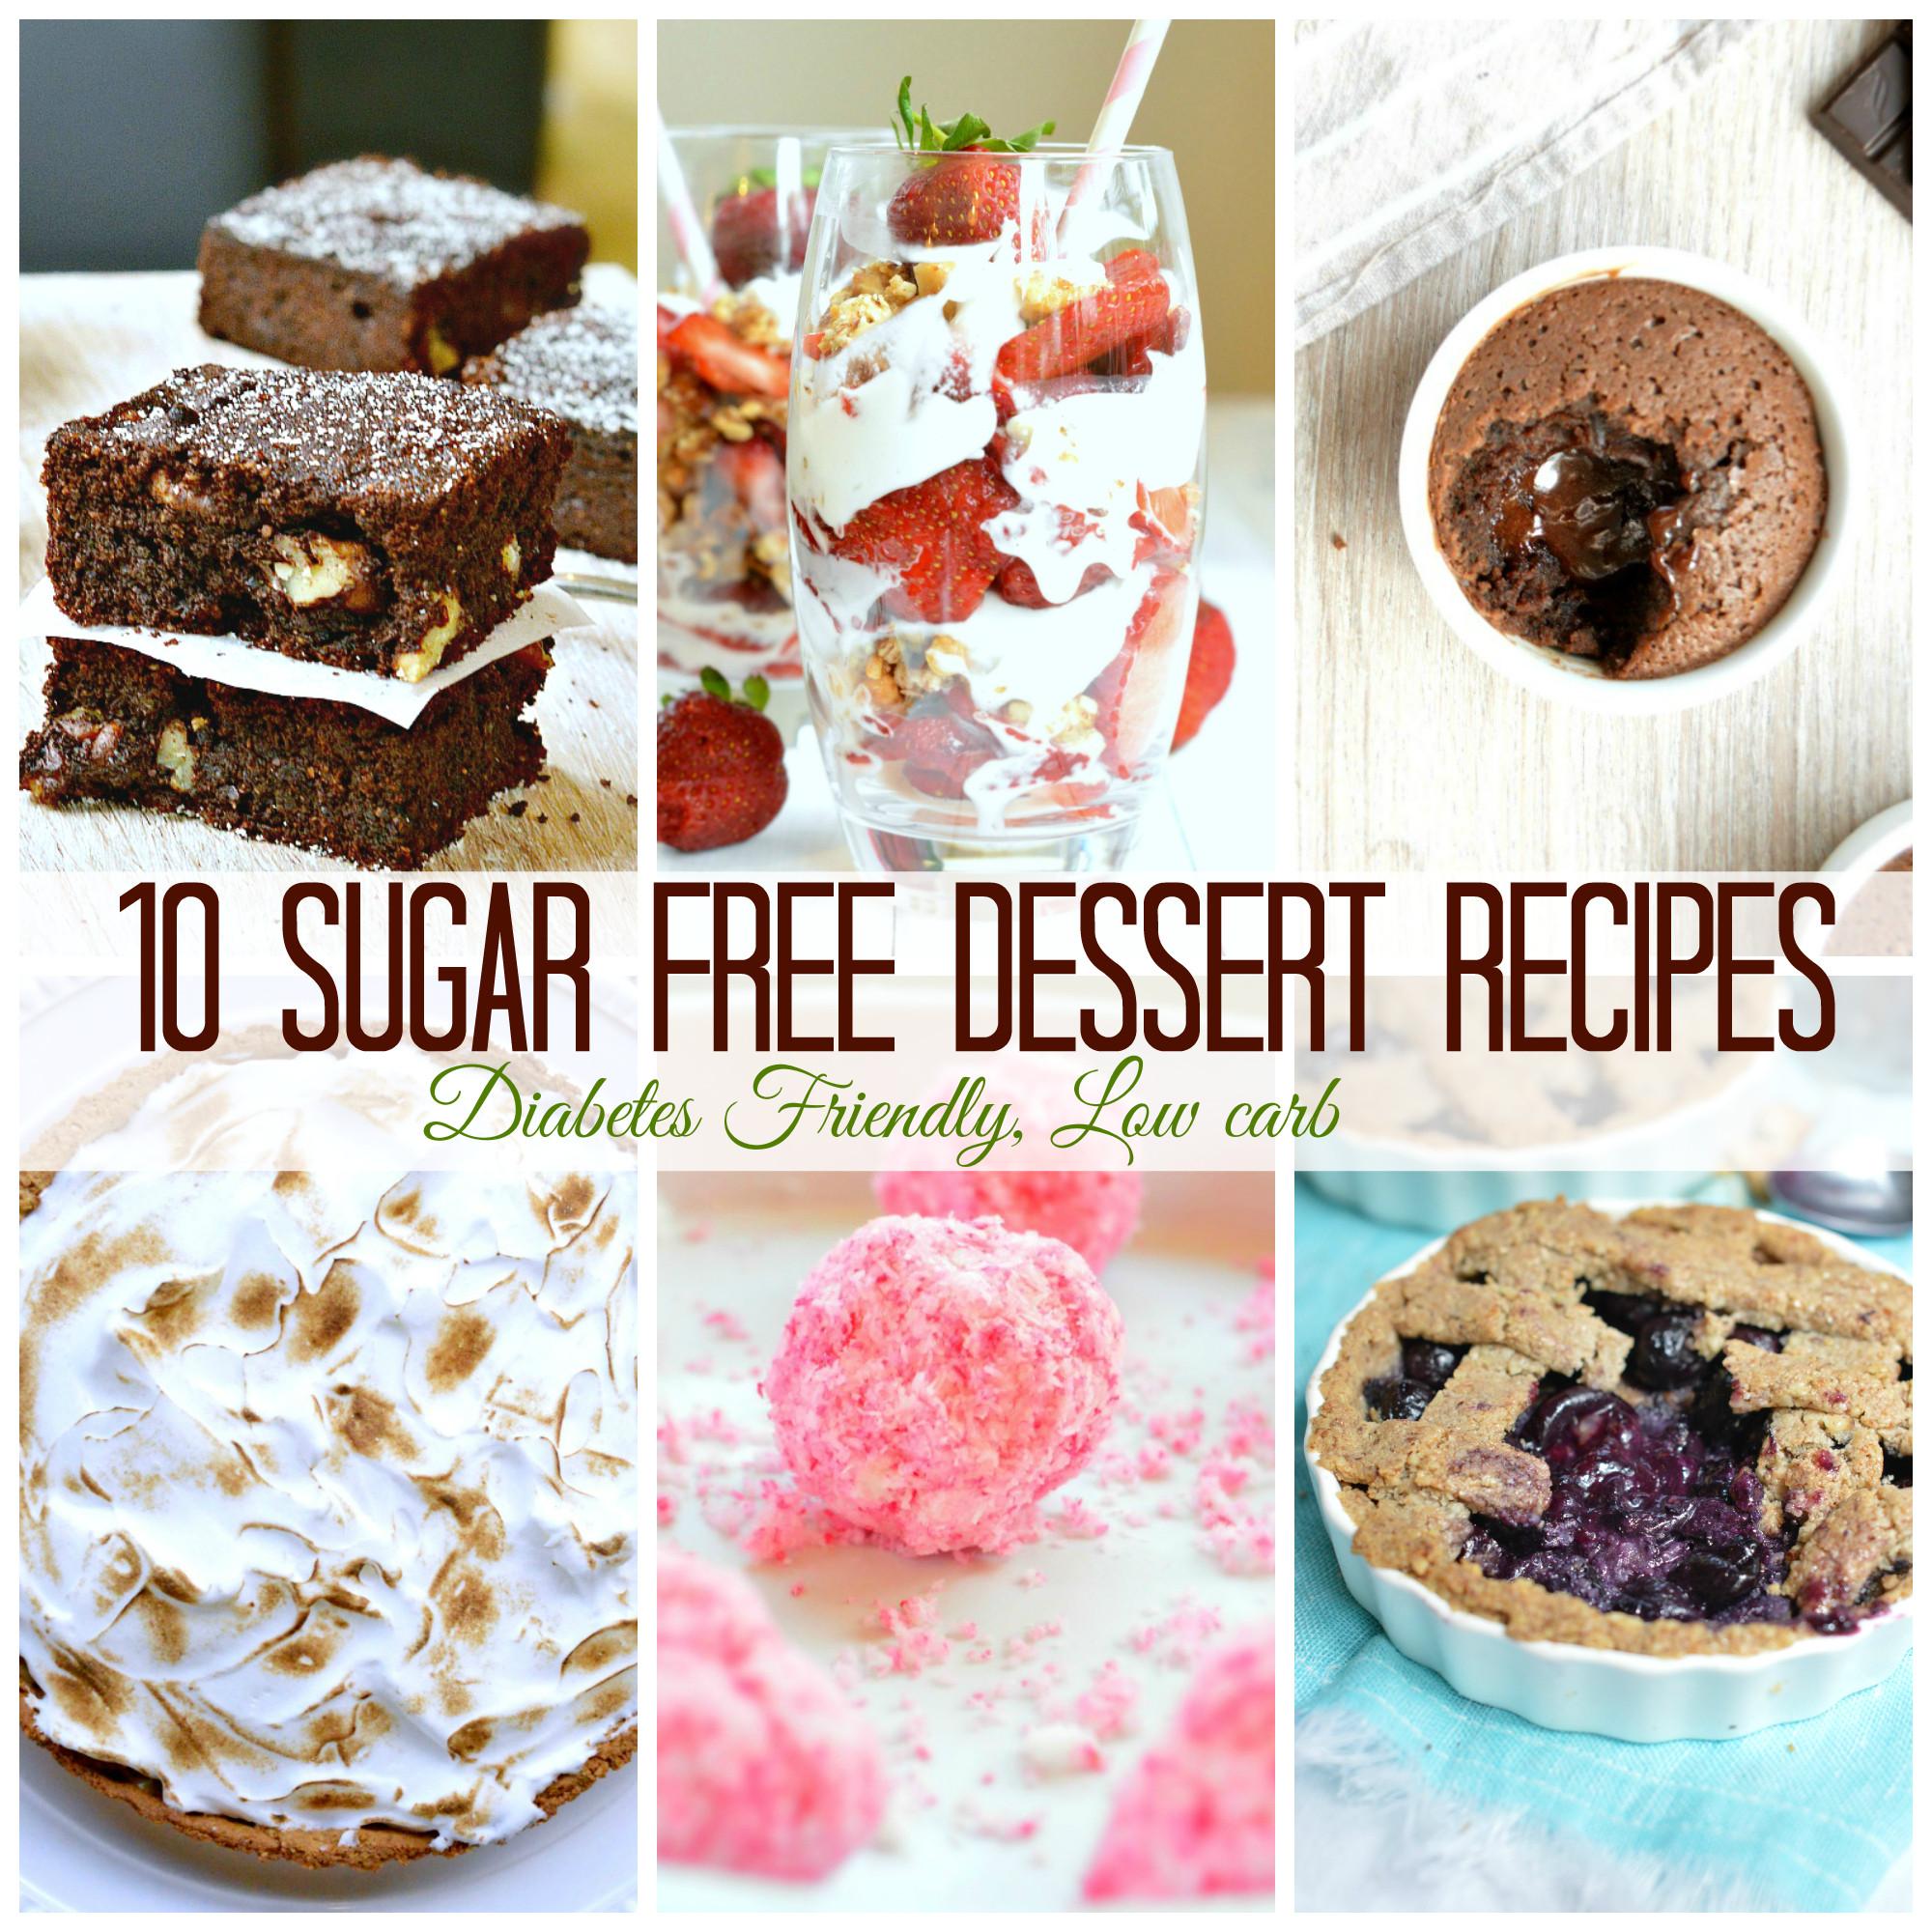 Sugar Free Desserts  10 Sugar Free Dessert for diabetics SWEETASHONEY